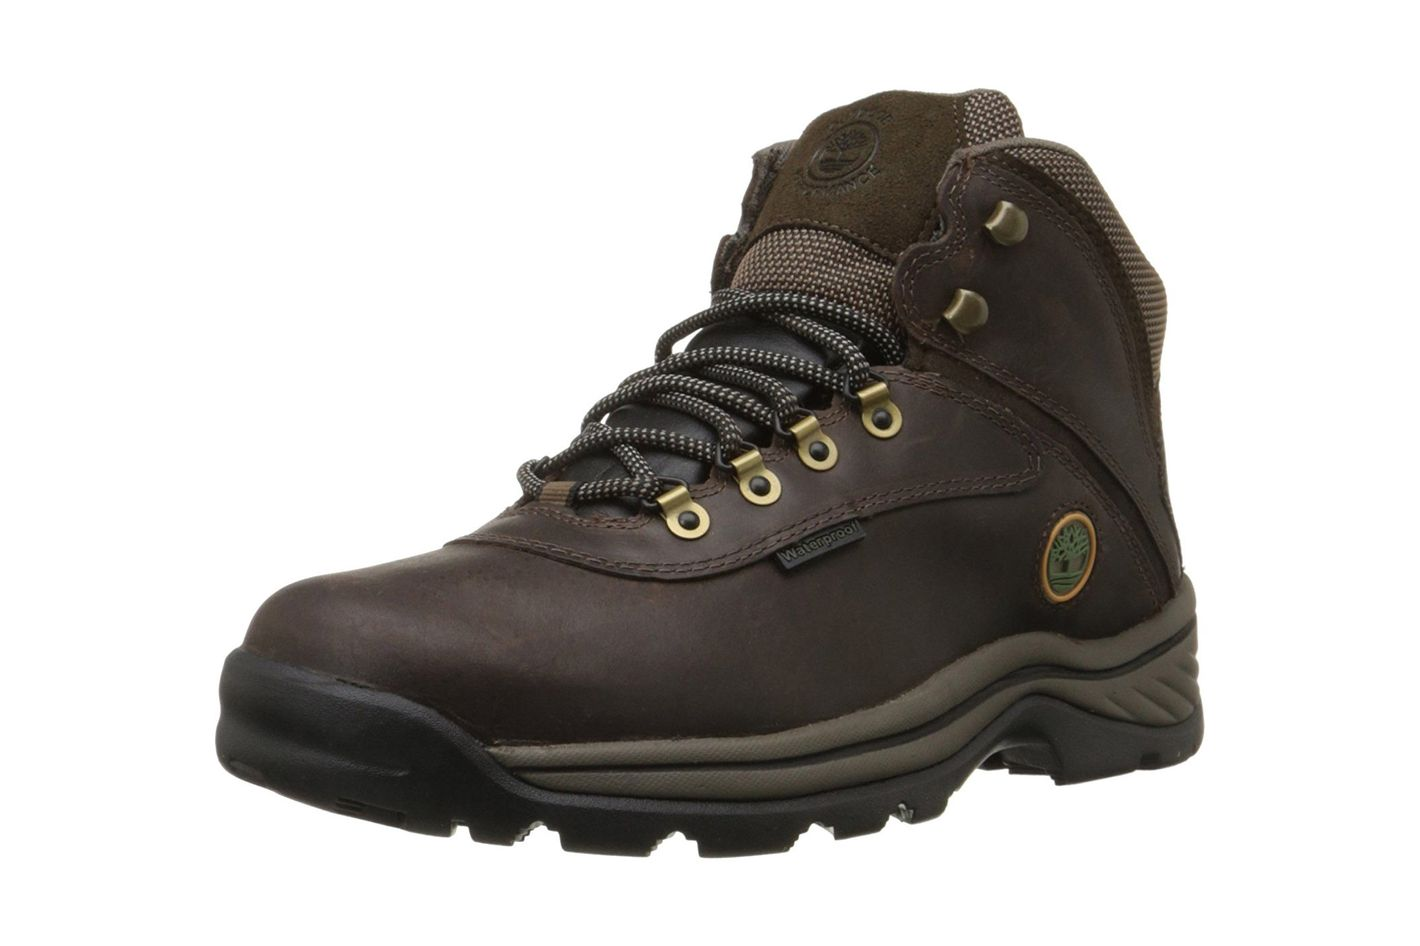 3d5c162c52d Timberland White Ledge Men s Waterproof Boot